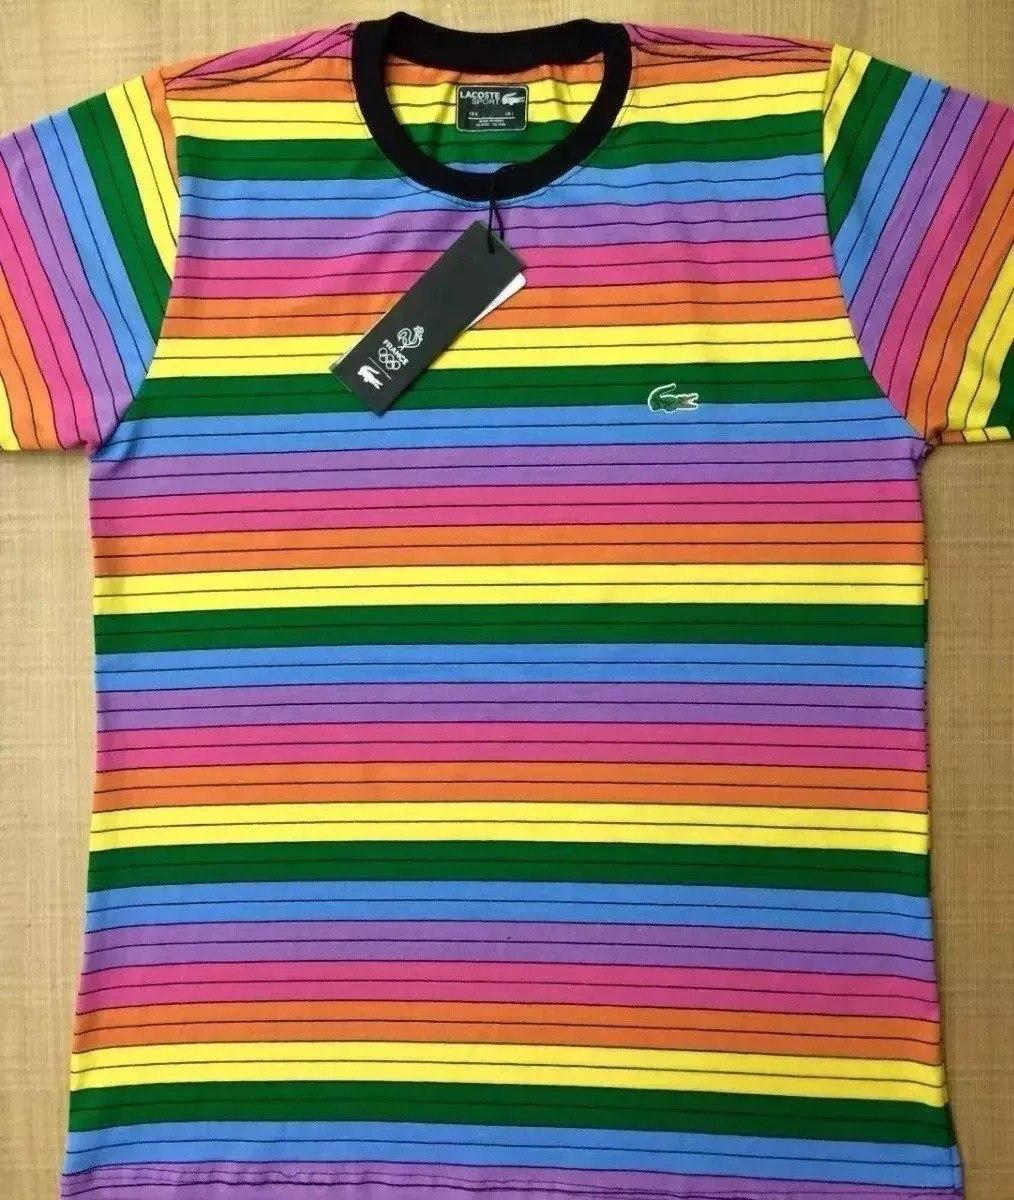 Camiseta Lacoste 3d Arco Íris Masculina Importada Peruana - R  75,00 ... fa871d8d97